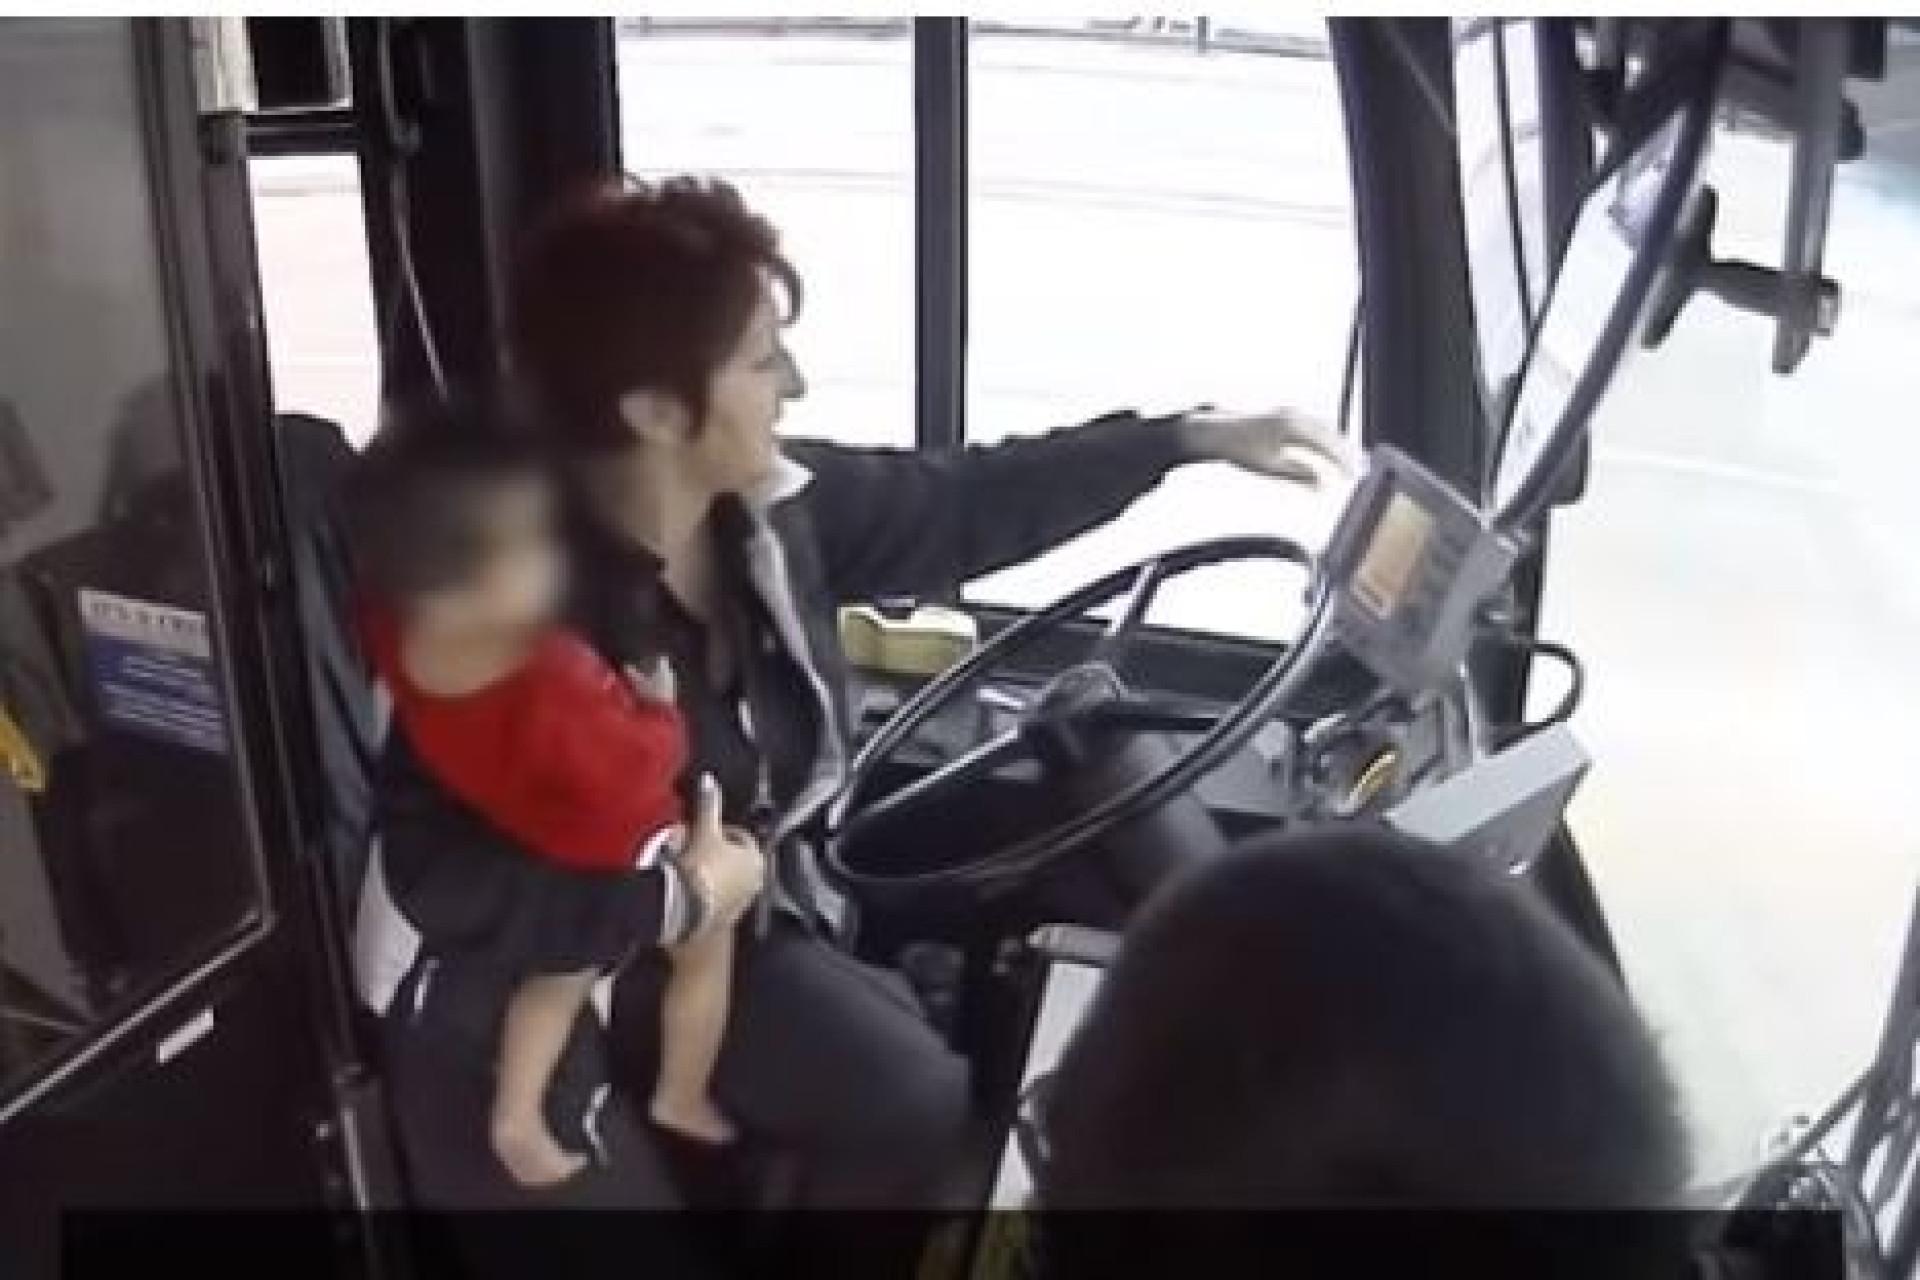 Motorista de autocarro salva menino perdido na rua